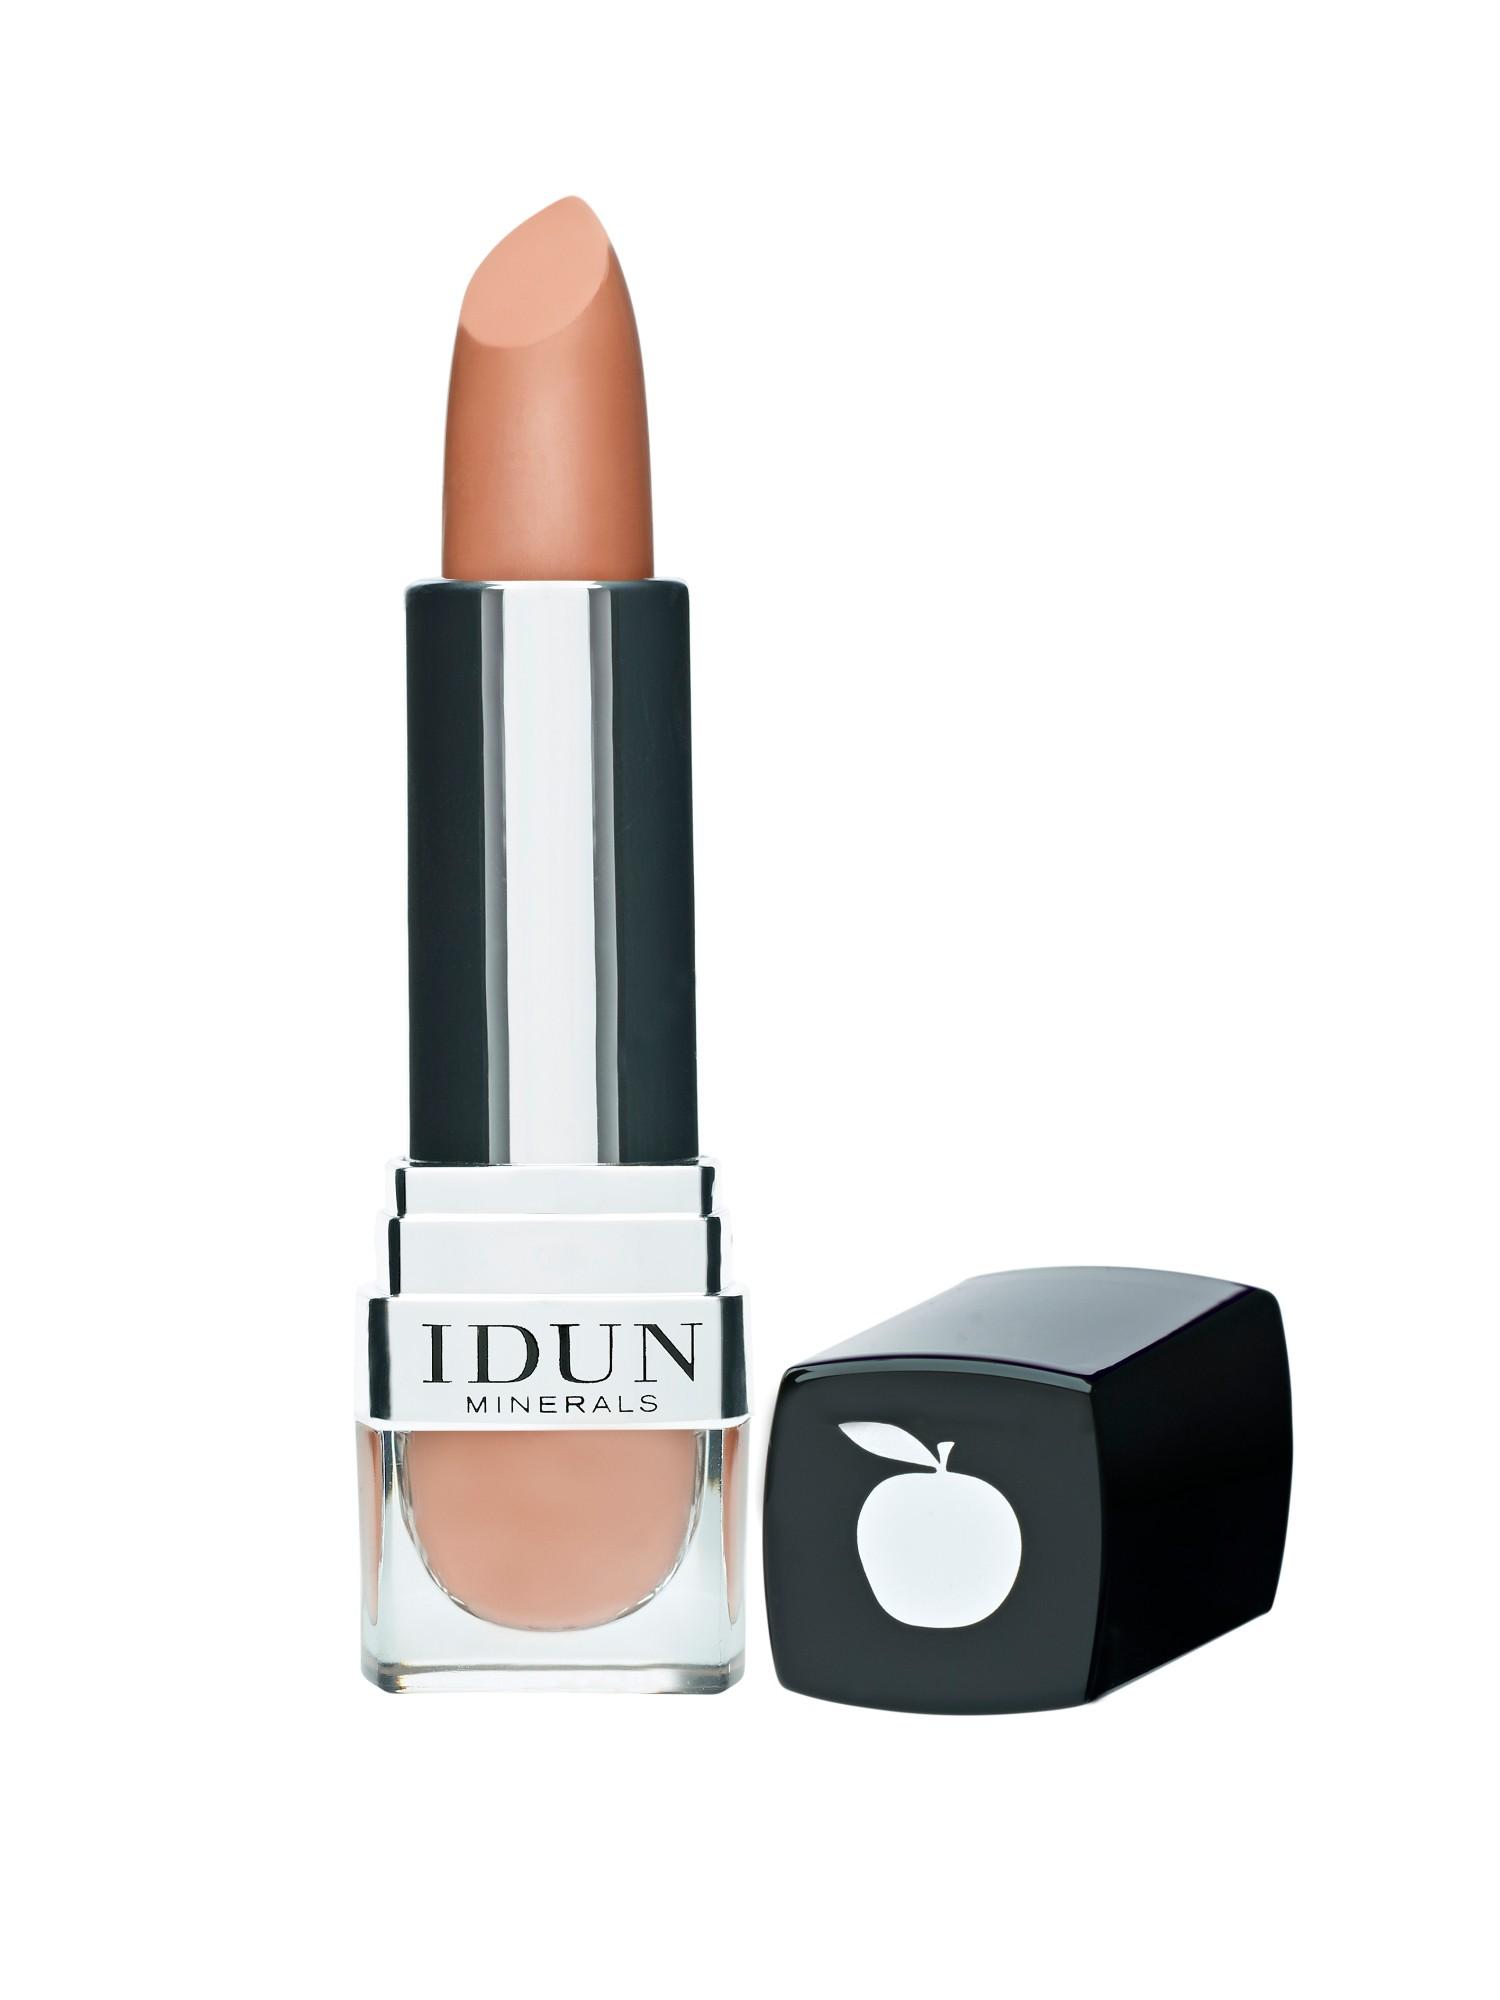 Matiniai lūpų dažai IDUN MINERALS Hjortron, 4 g